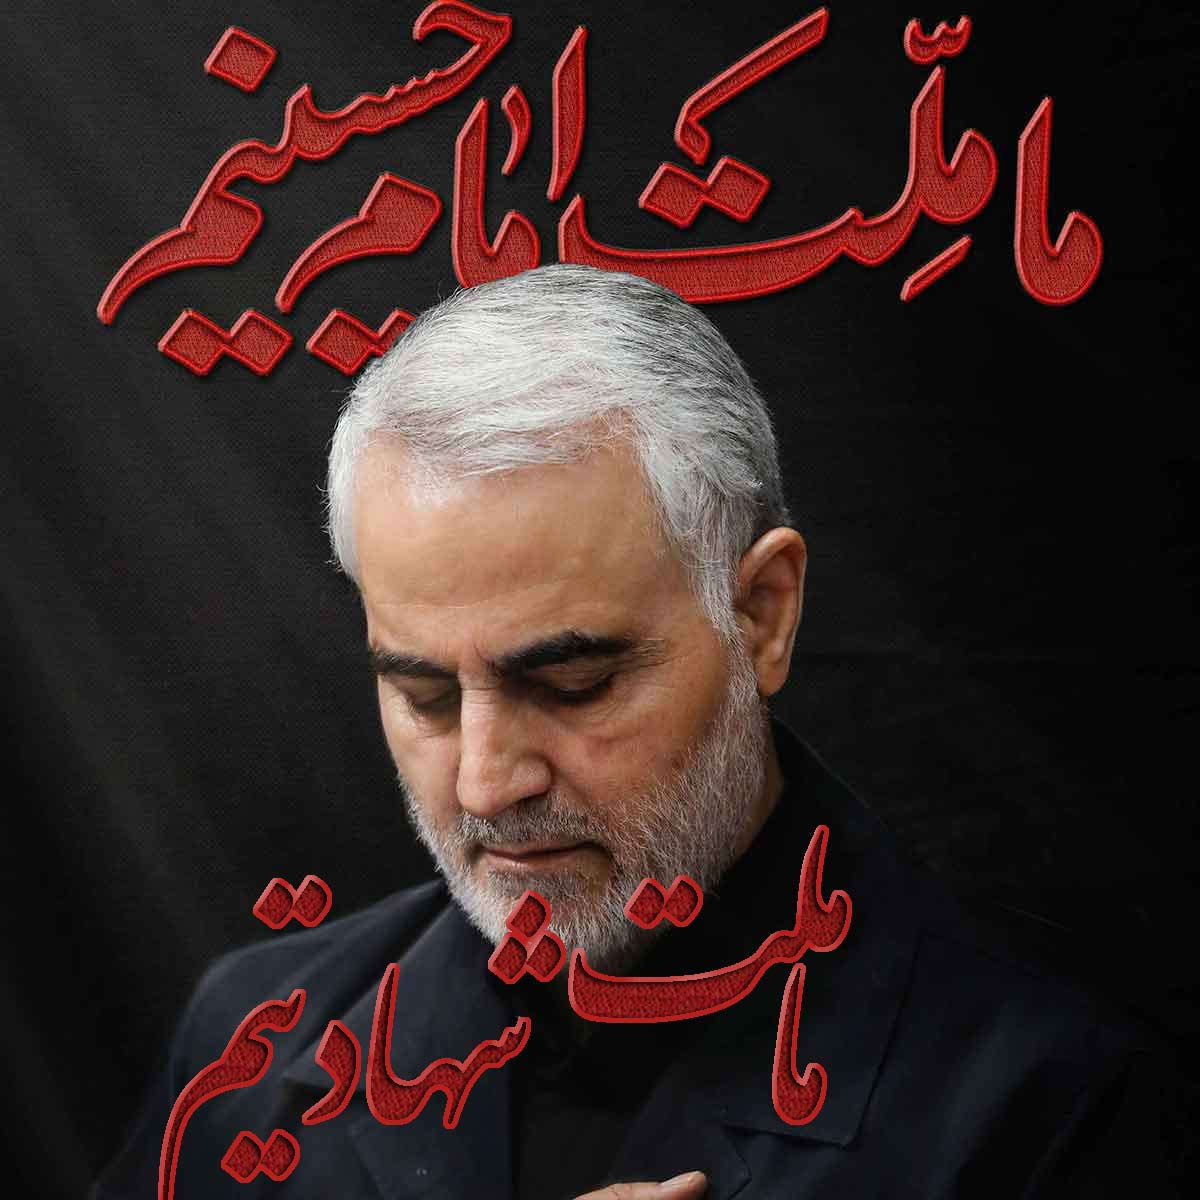 ما ملت شهادتیم ما ملت امام حسینیم